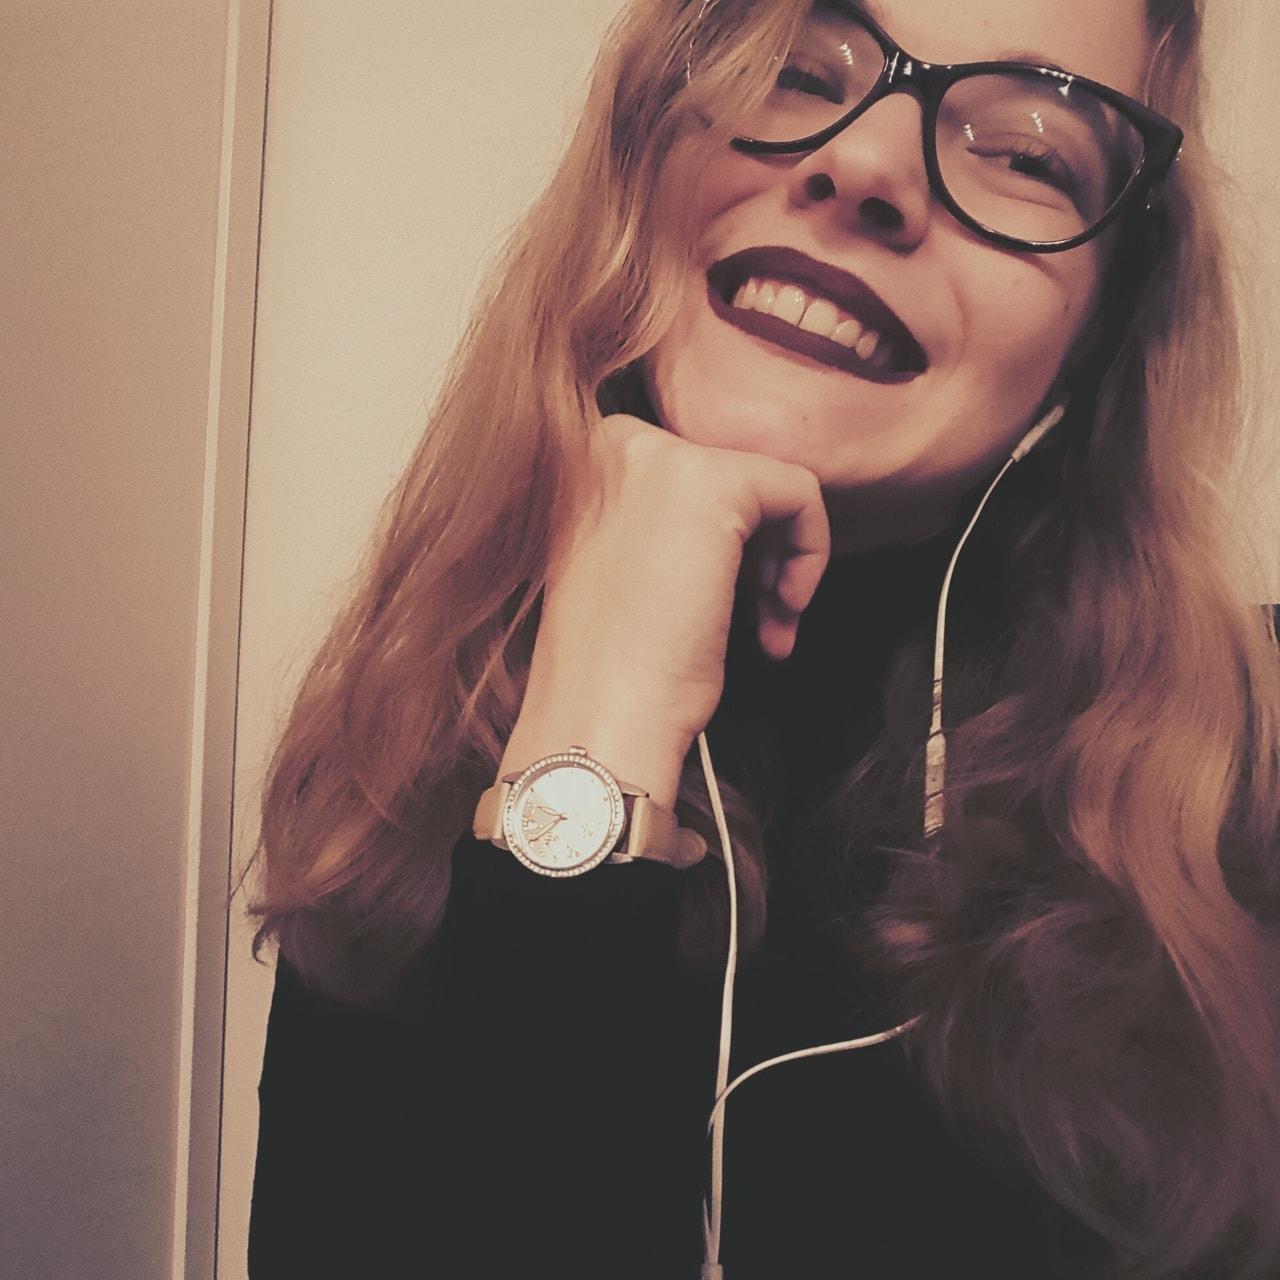 light, me, and smile image